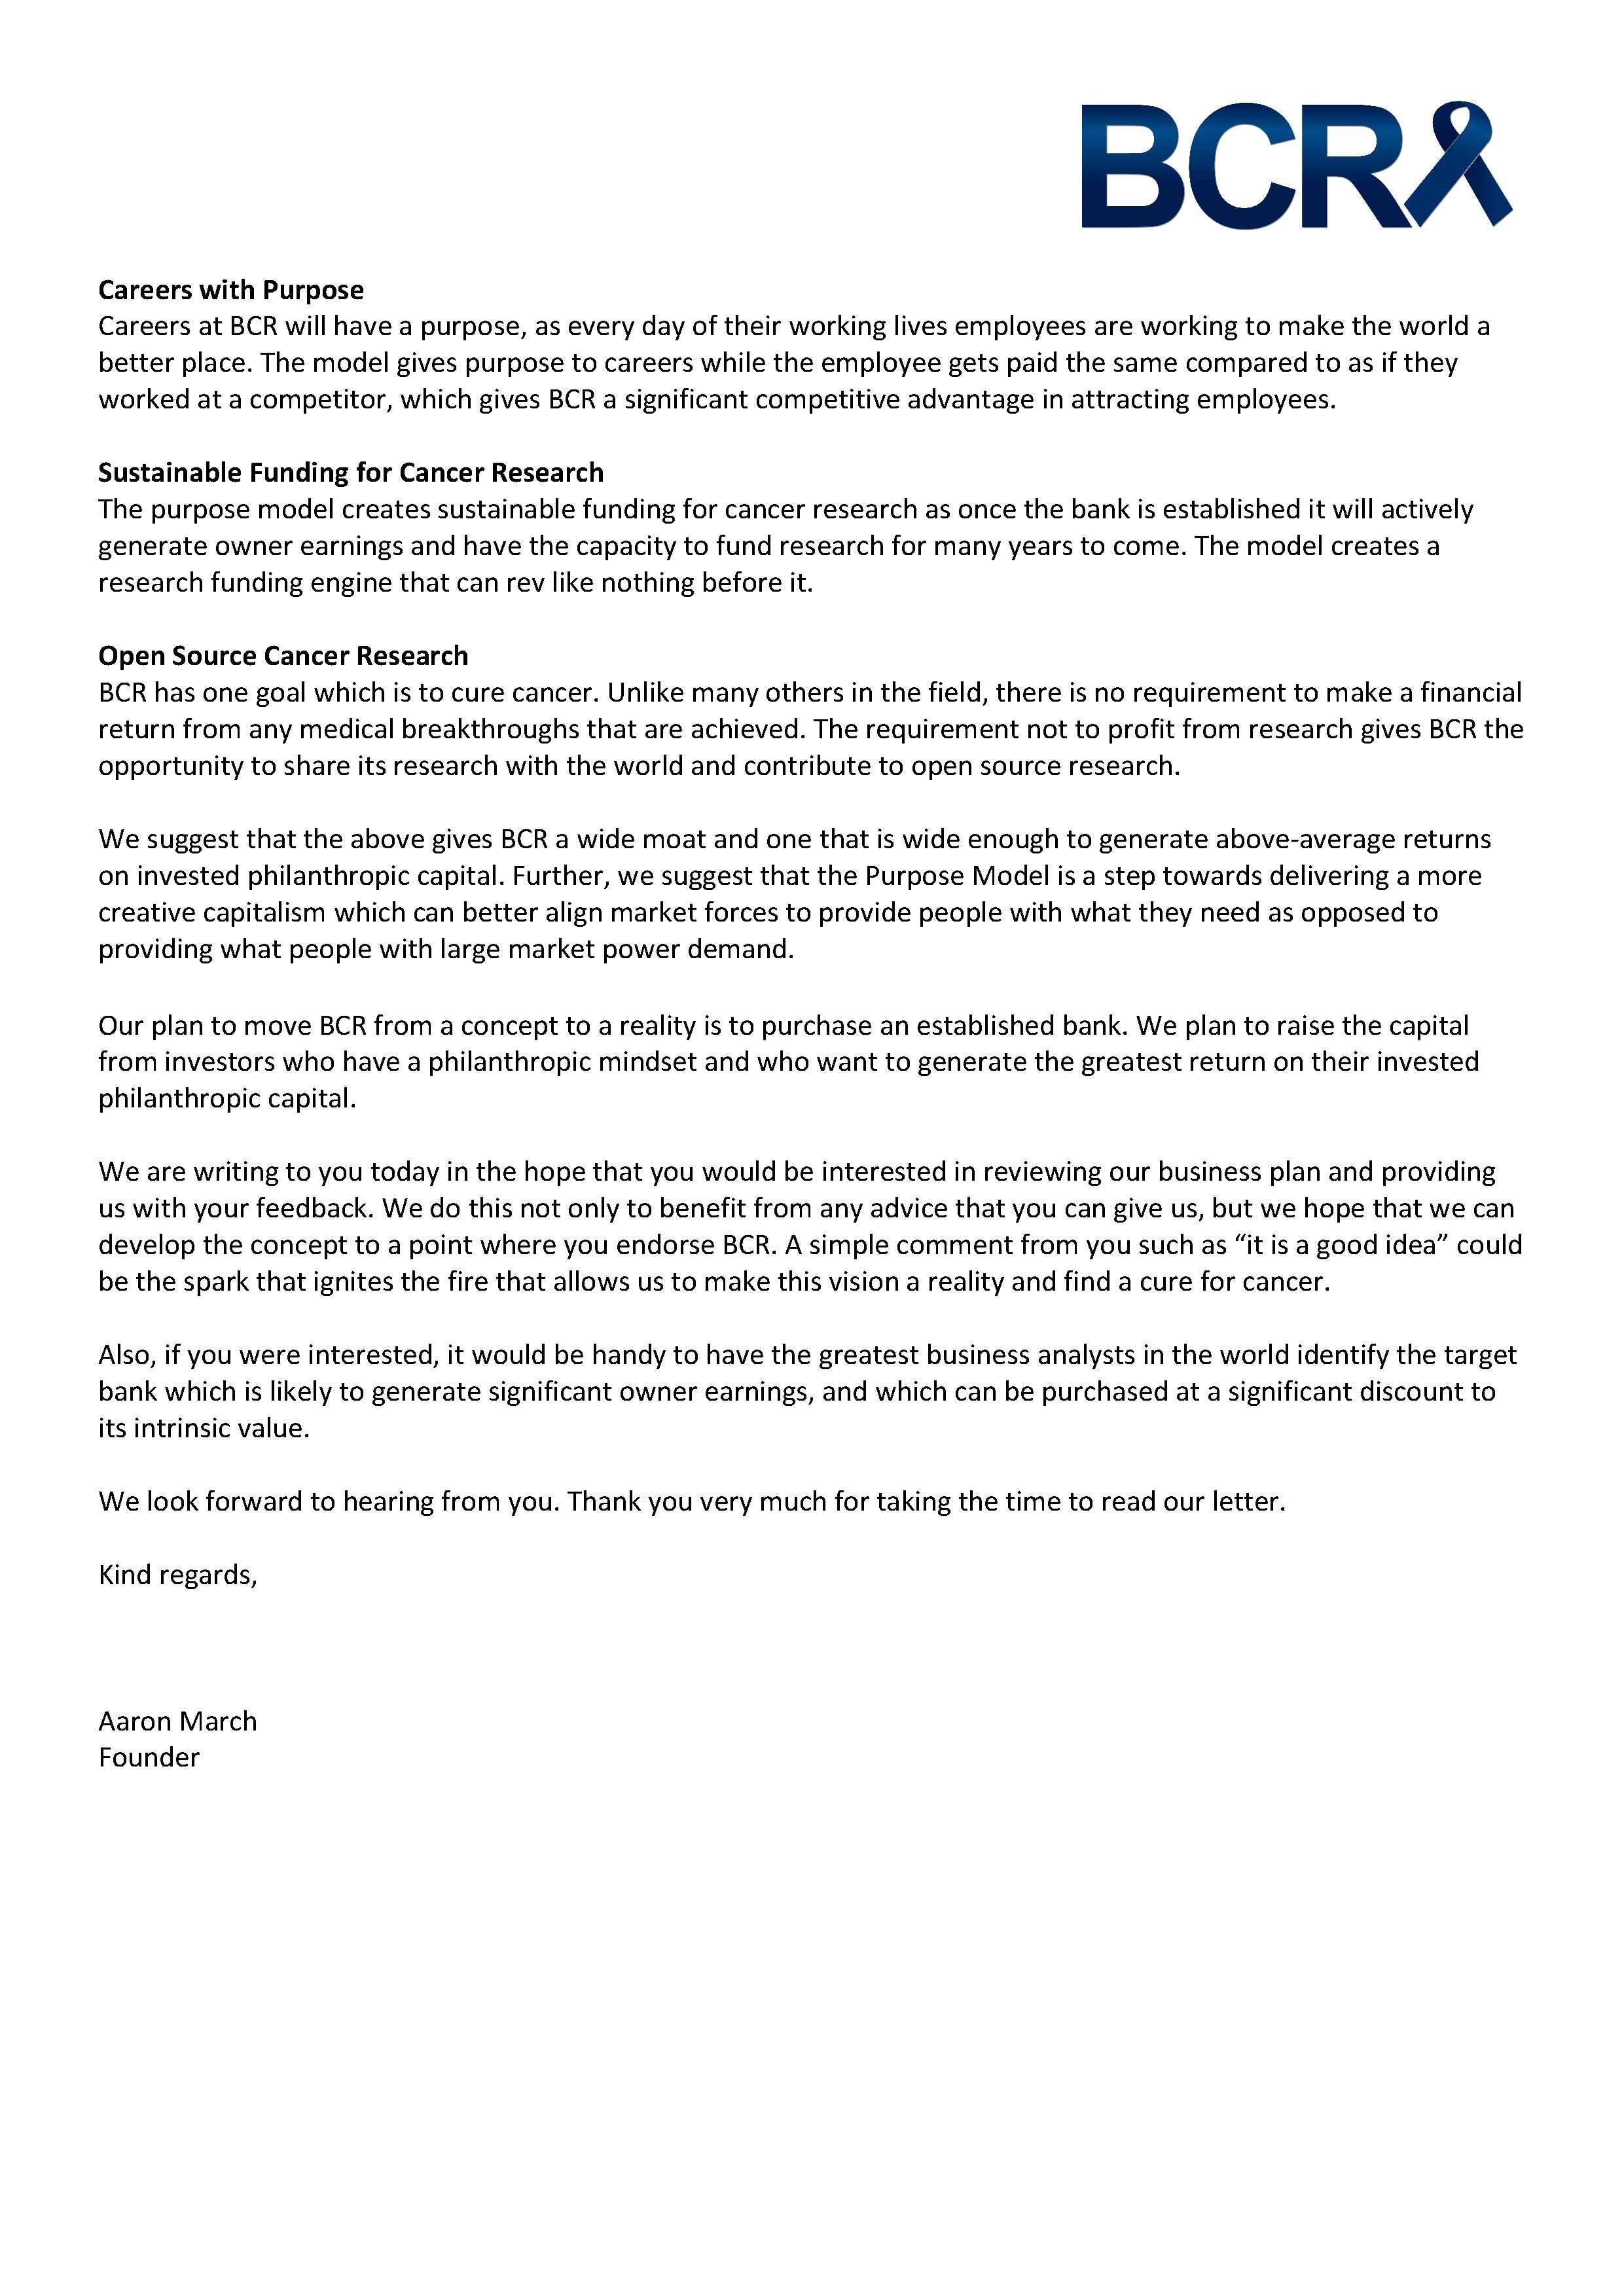 Letter to Warren Buffett and Charlie Munger from BCR-2.jpg